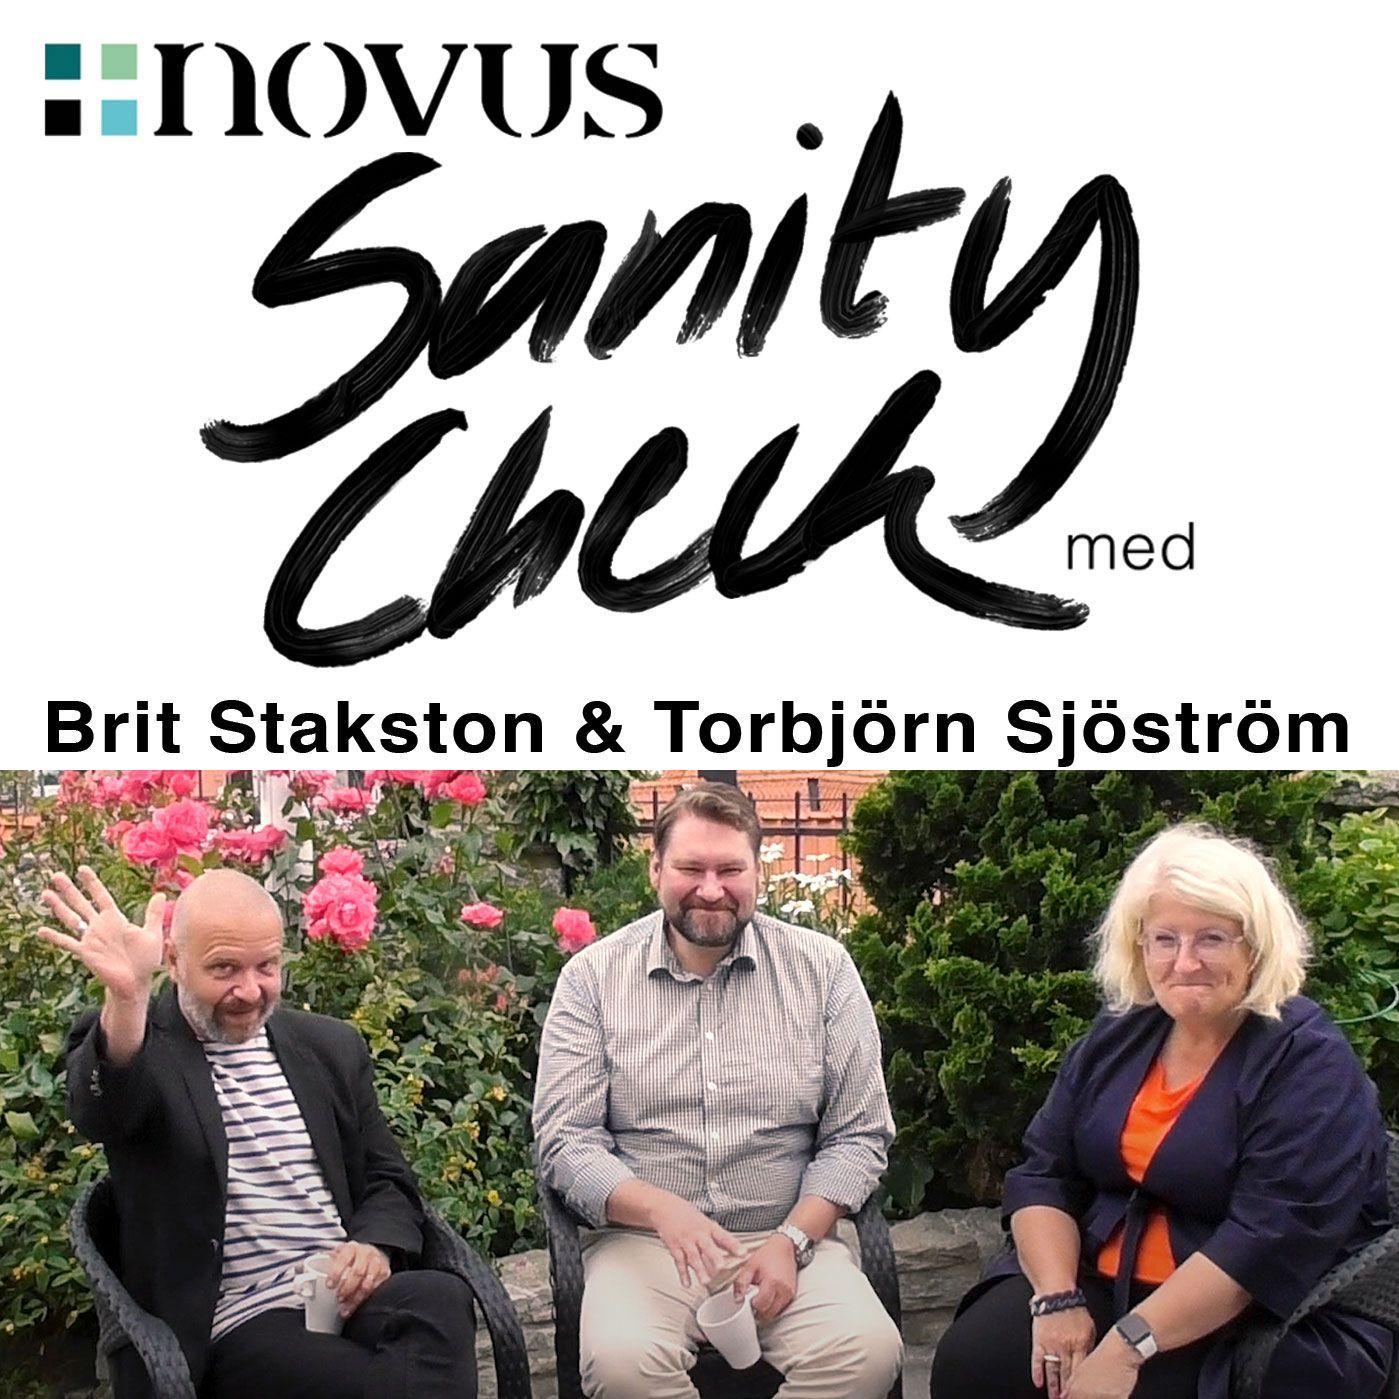 Avsnitt 35 - Brit Stakston & Torbjörn Sjöström gäst Kent Wisti